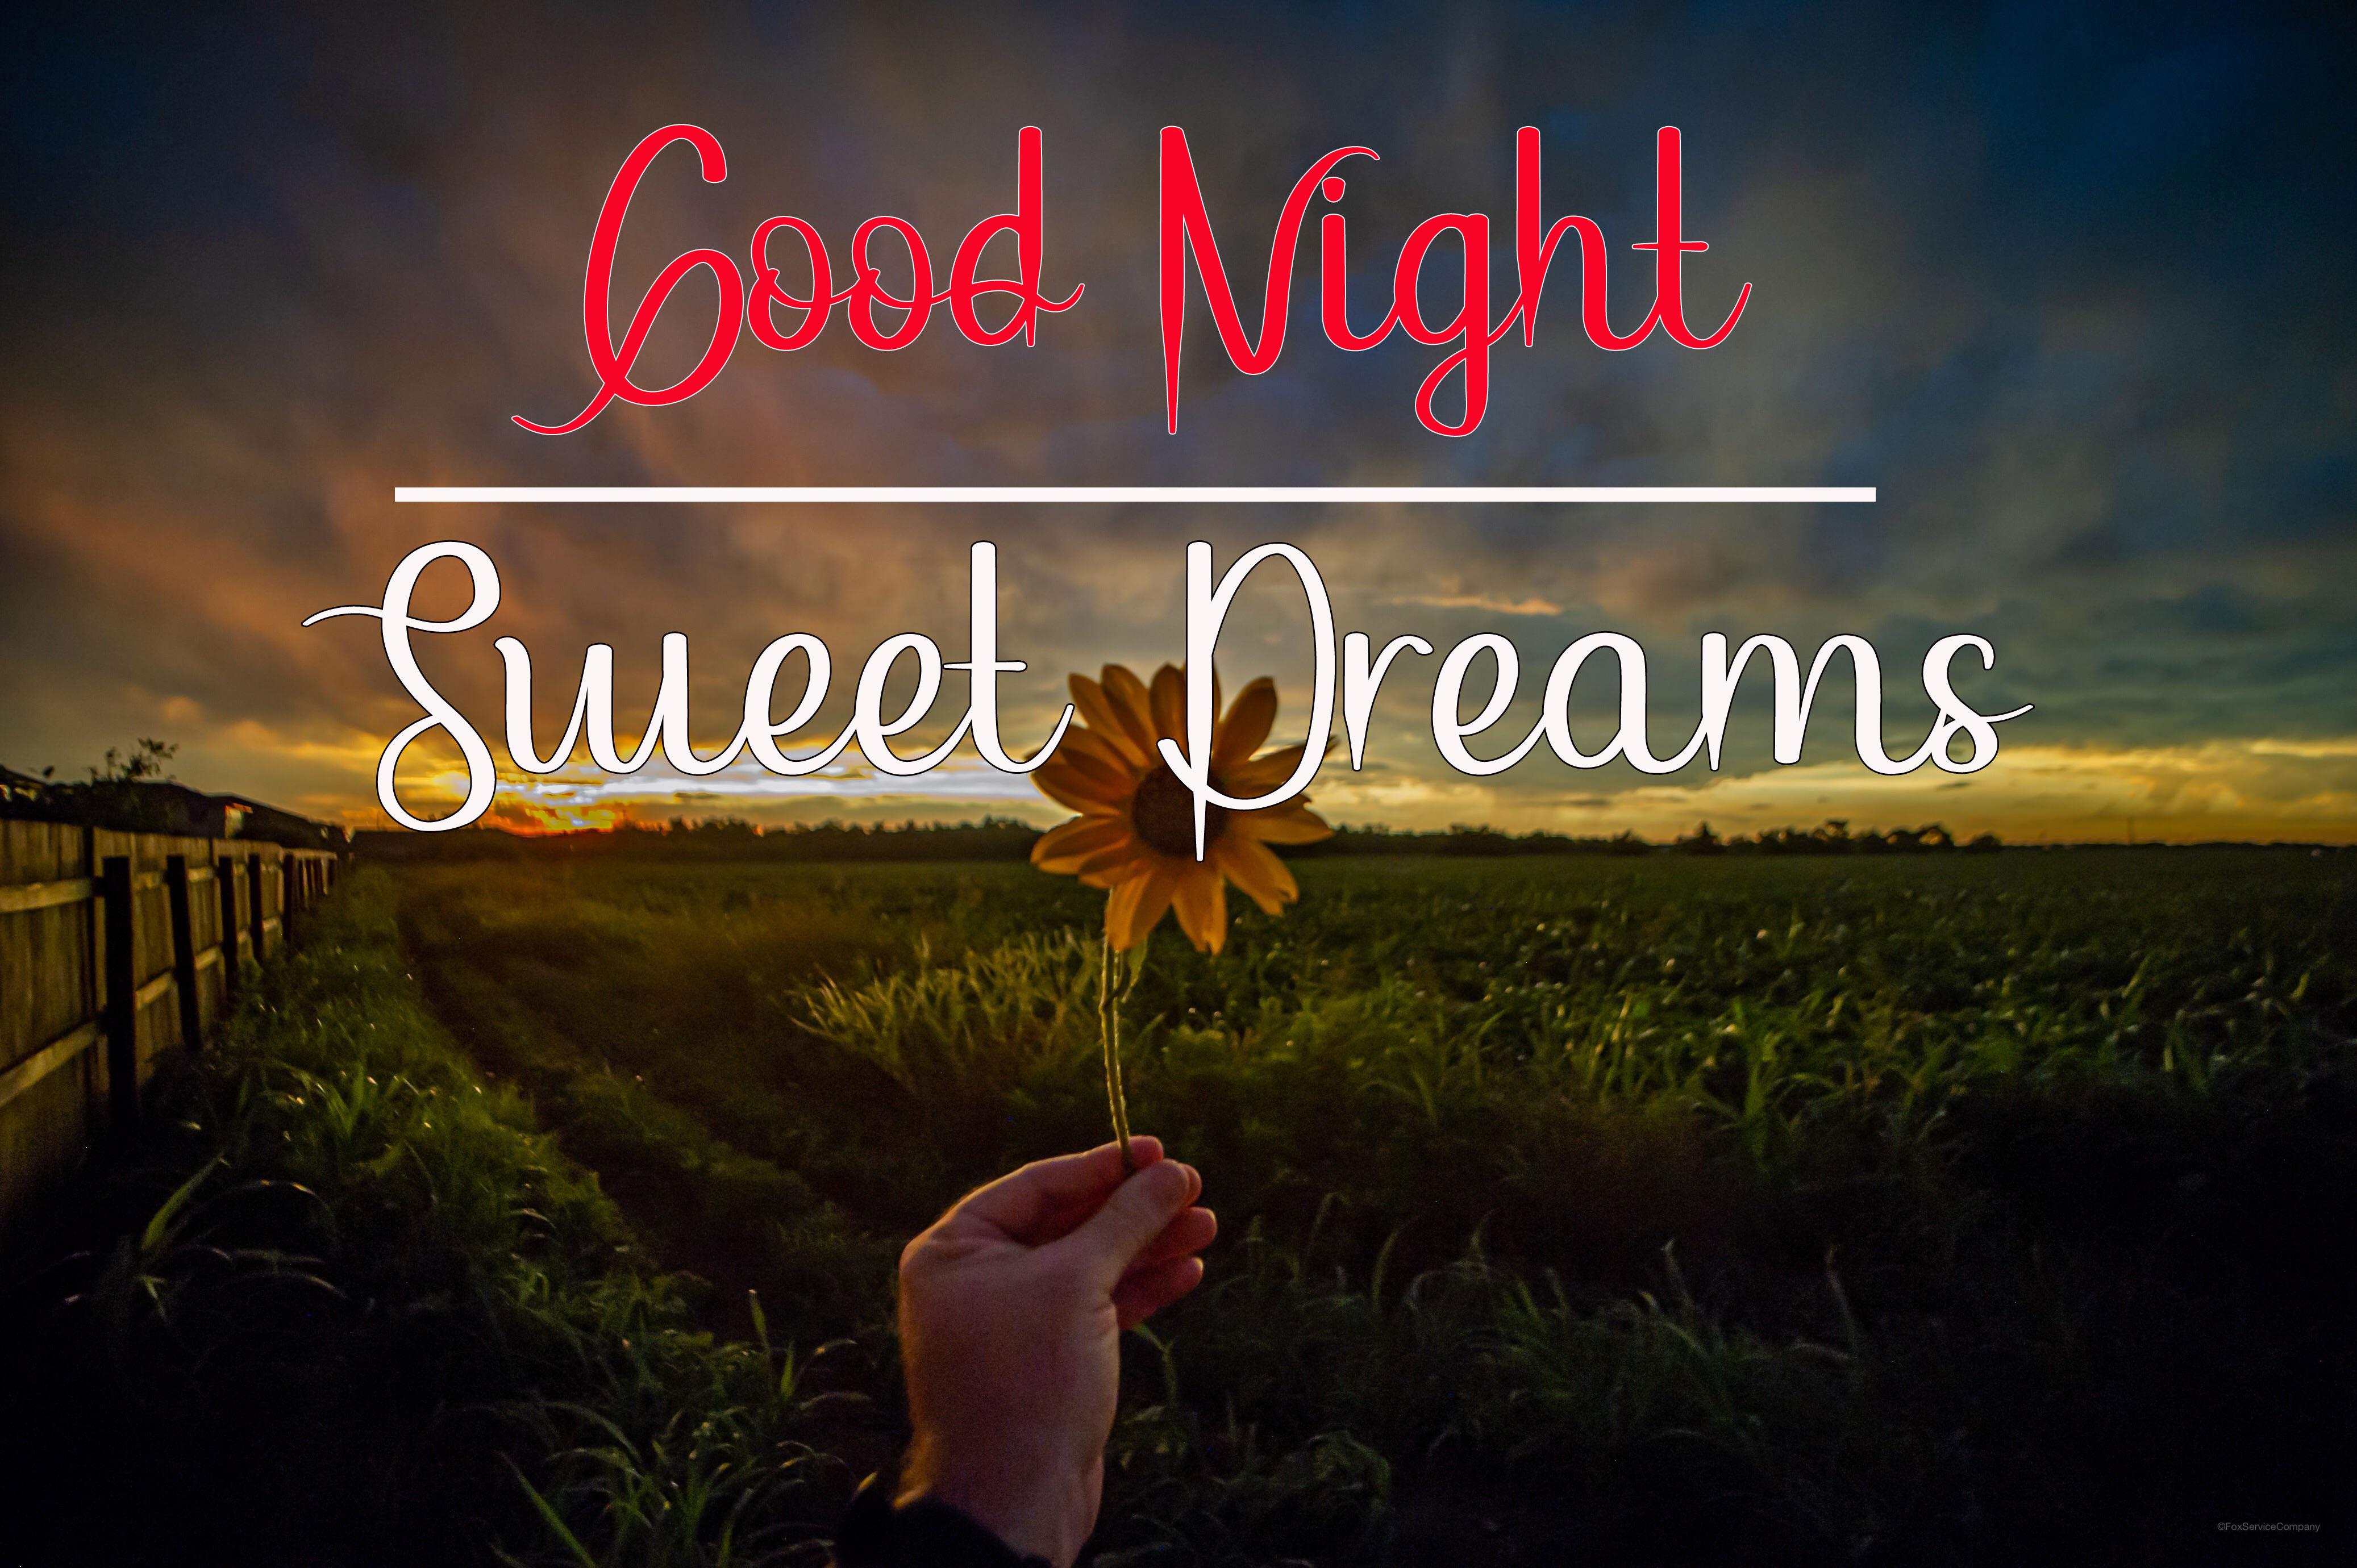 Best Good Night Images pics wallpaper download